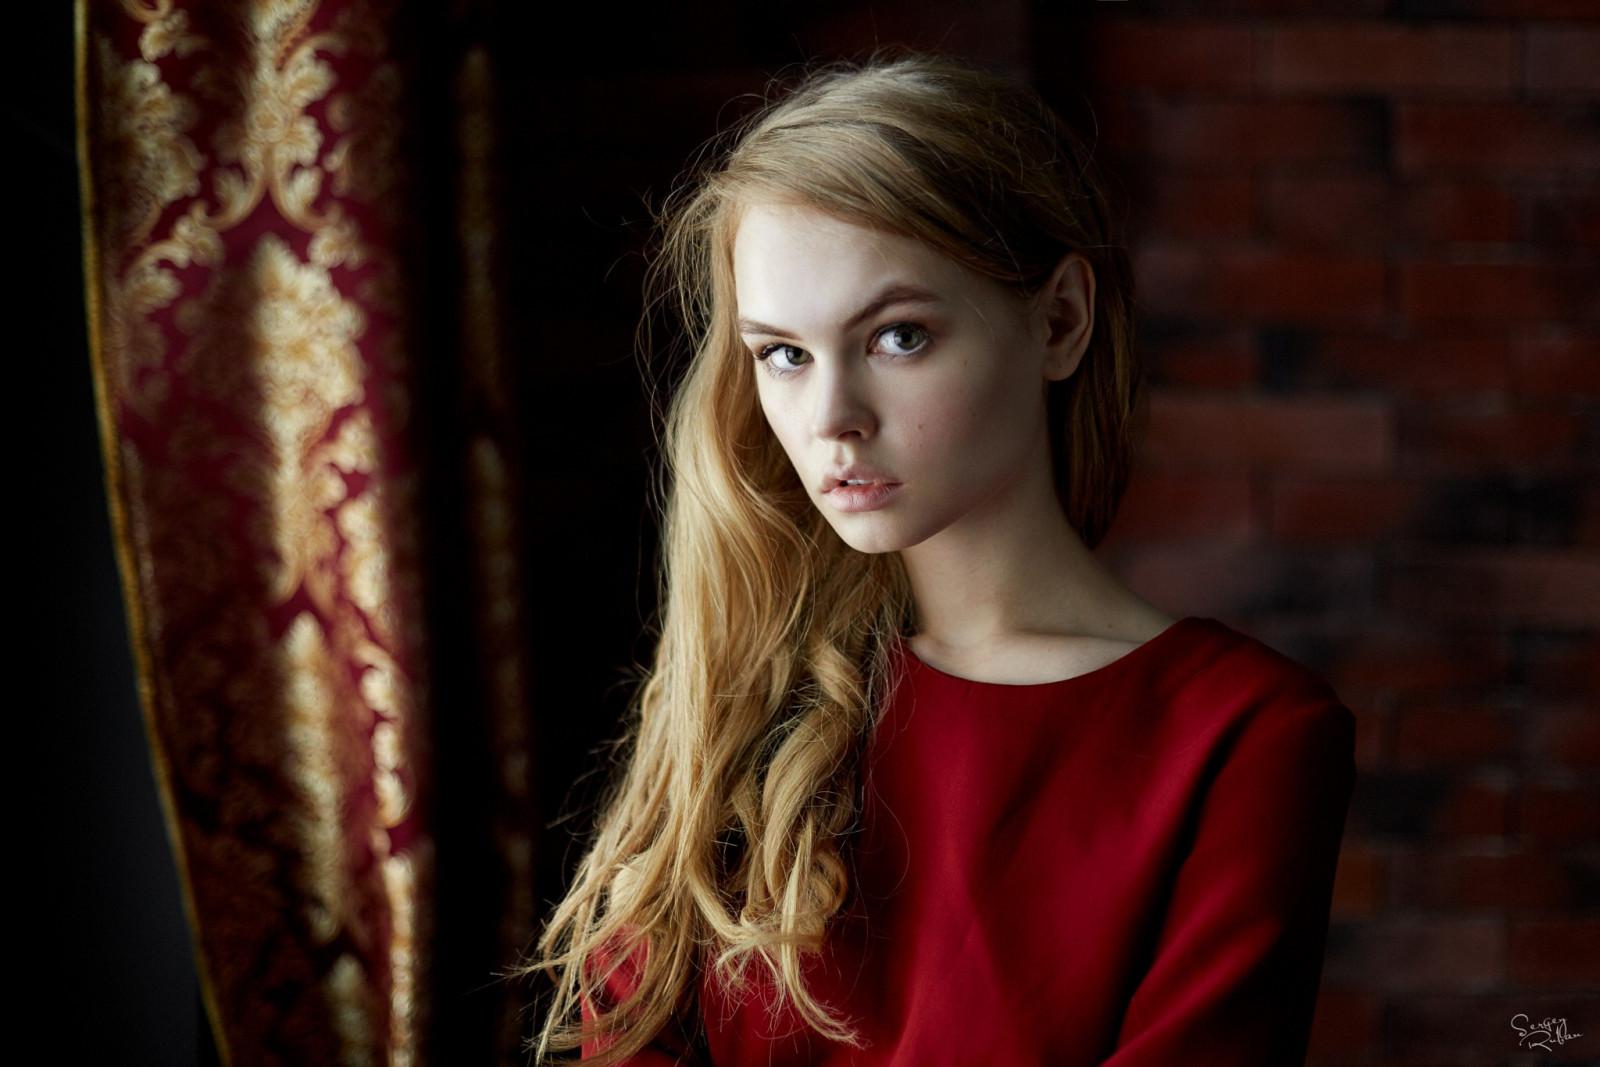 women, model, portrait, blonde, long hair, red, Anastasia Scheglova, photography, fashion, hair, Person, supermodel, girl, beauty, eye, woman, lady, hairstyle, portrait photography, photo shoot, brown hair, art model